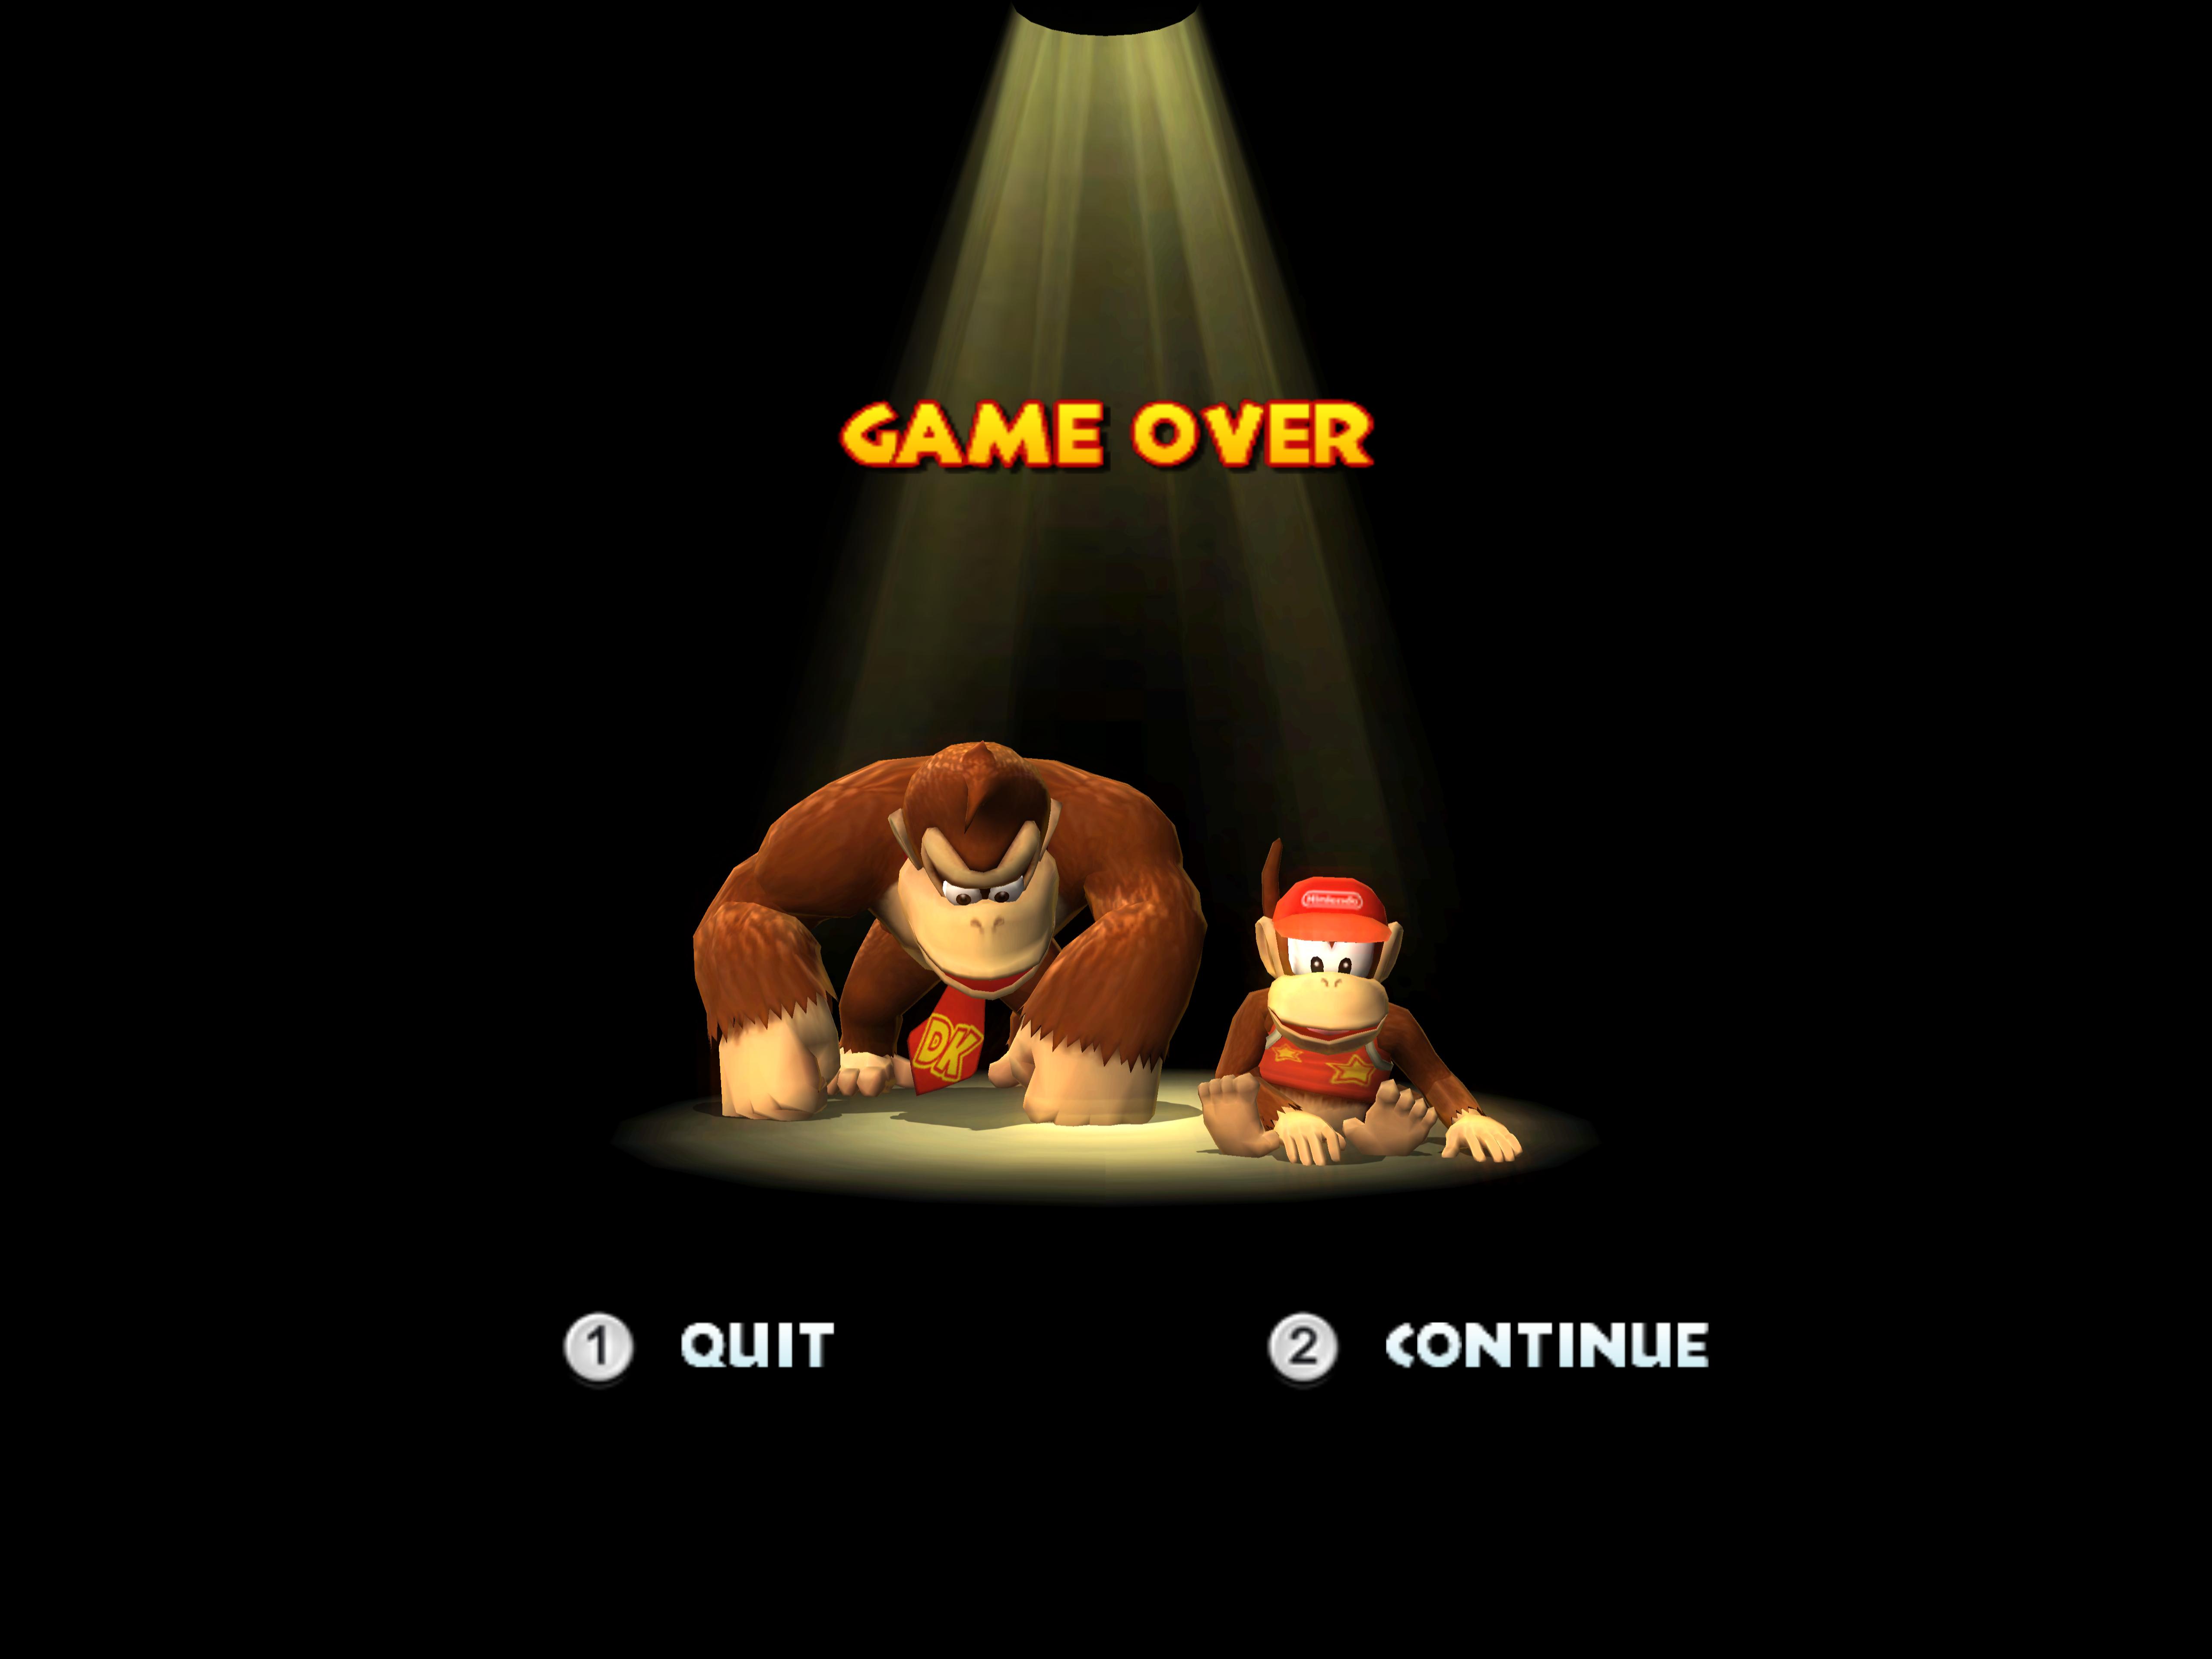 Game Over Screens | Donkey Kong Wiki | FANDOM powered by Wikia